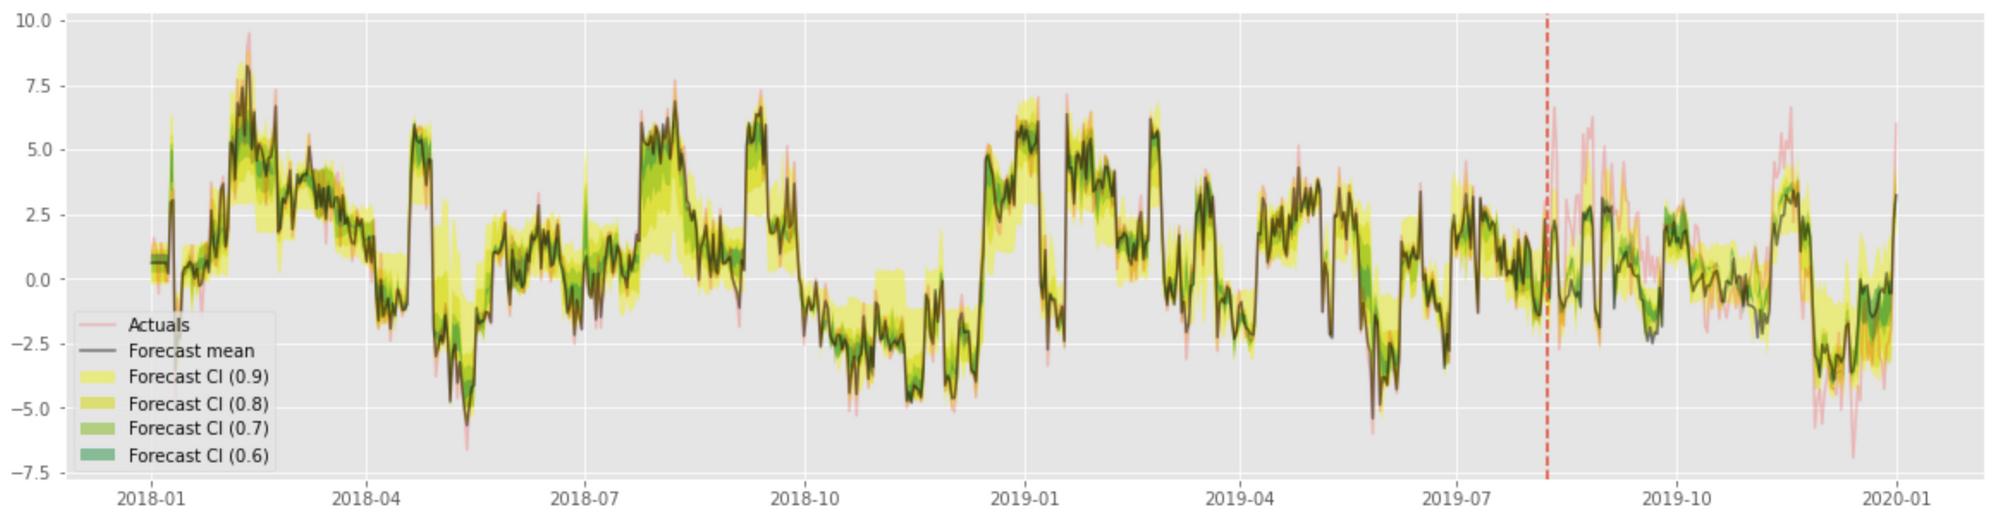 tsd-003-quantile-regression